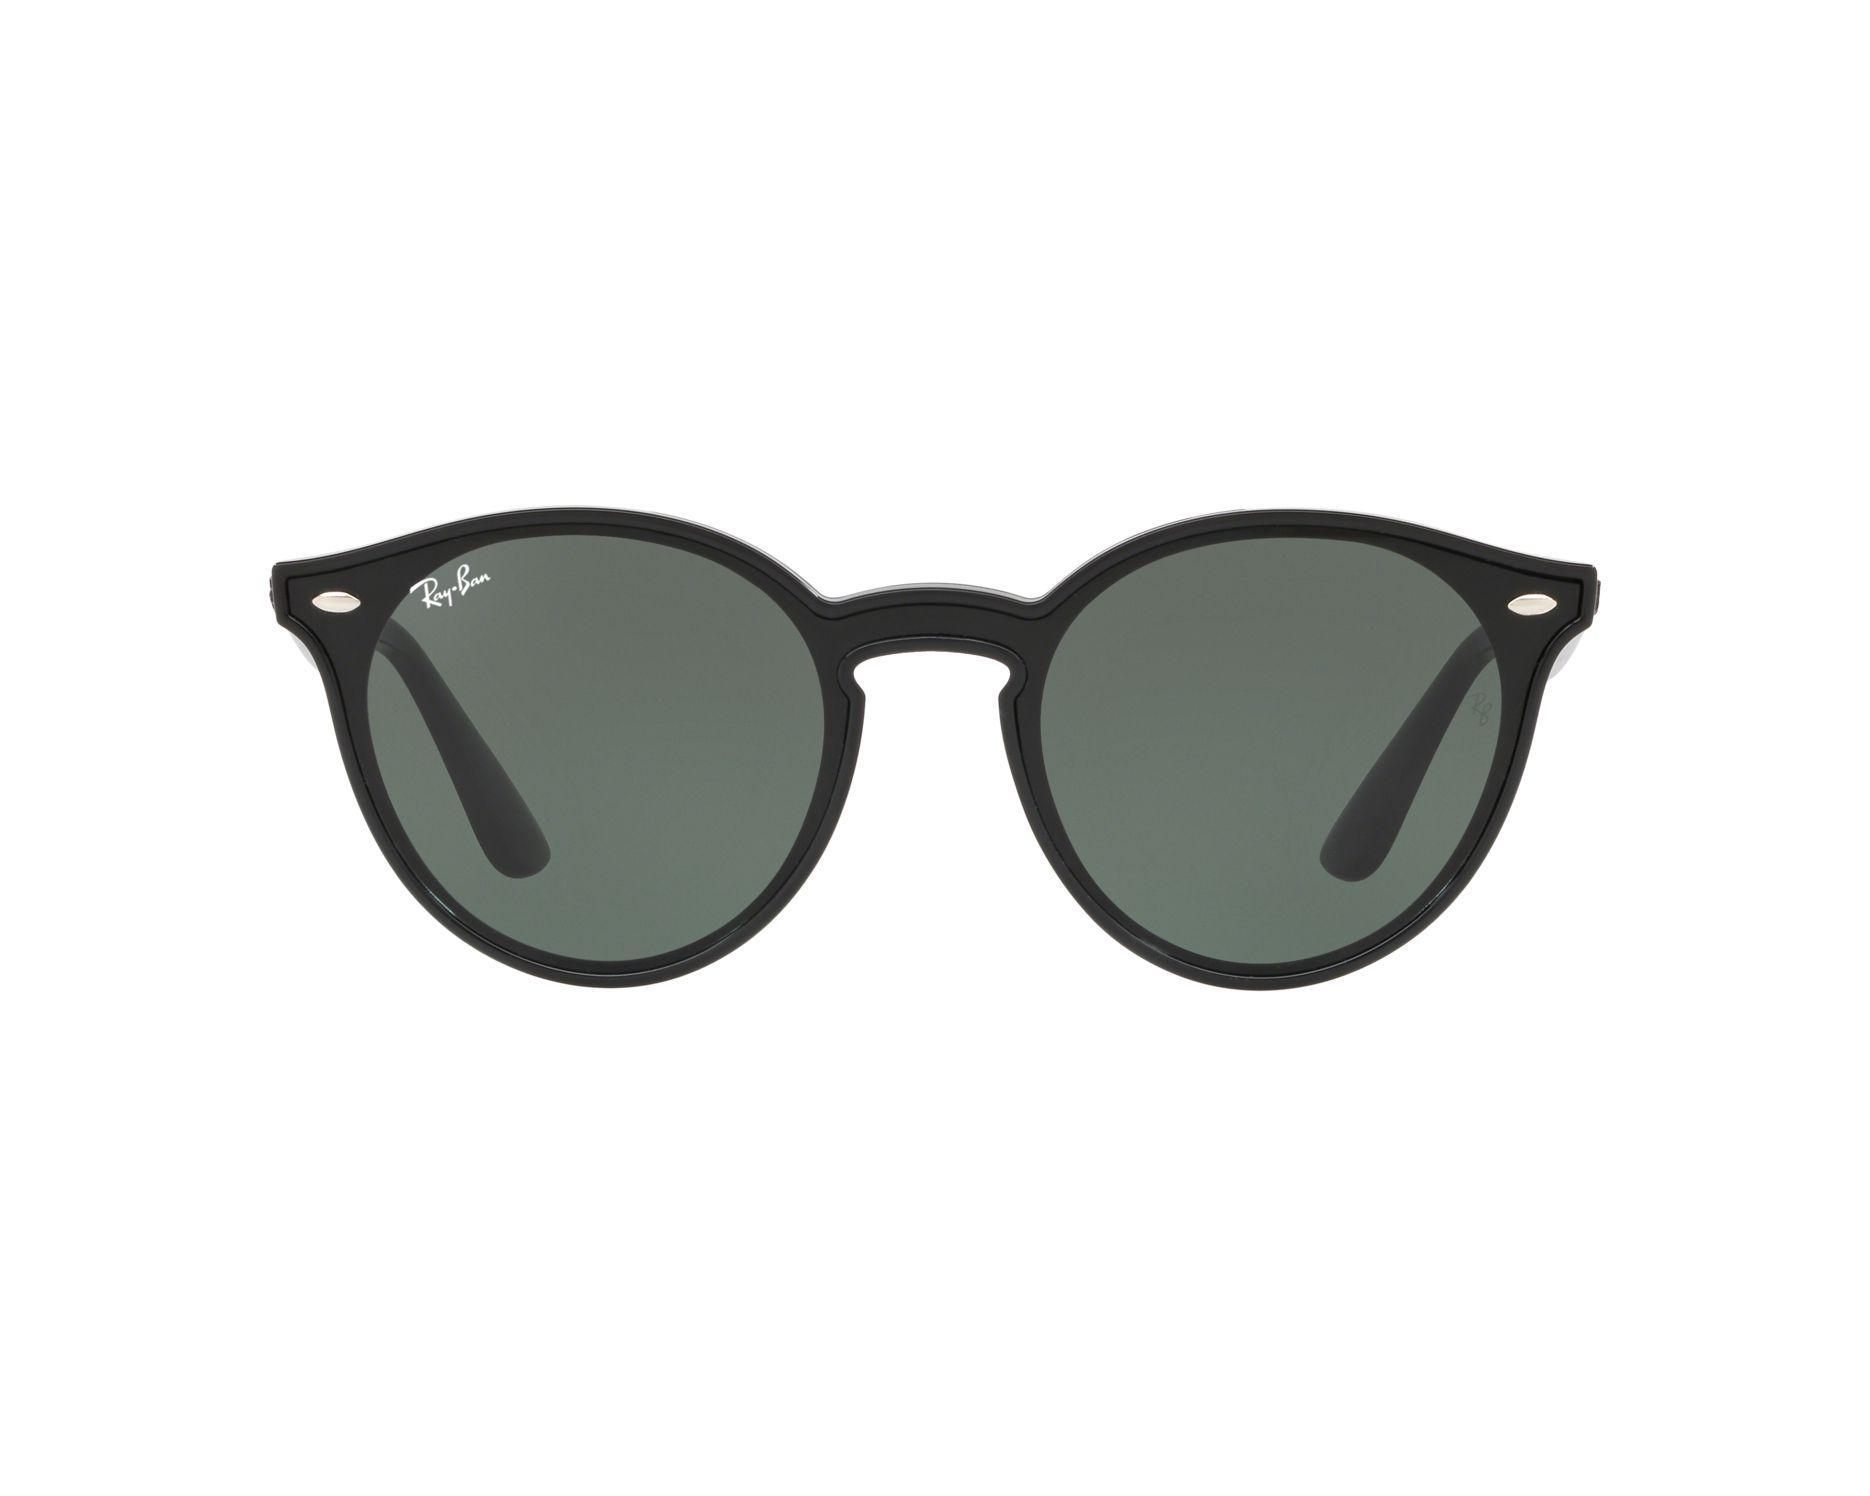 a5129c5d1e Sunglasses Ray-Ban RB-4380-N 601 71 55-18 Black